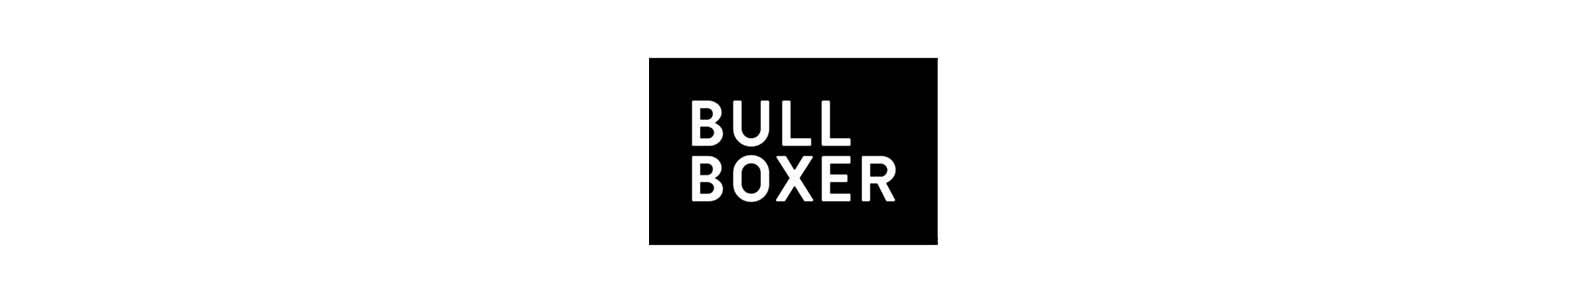 Bullboxer brand header image